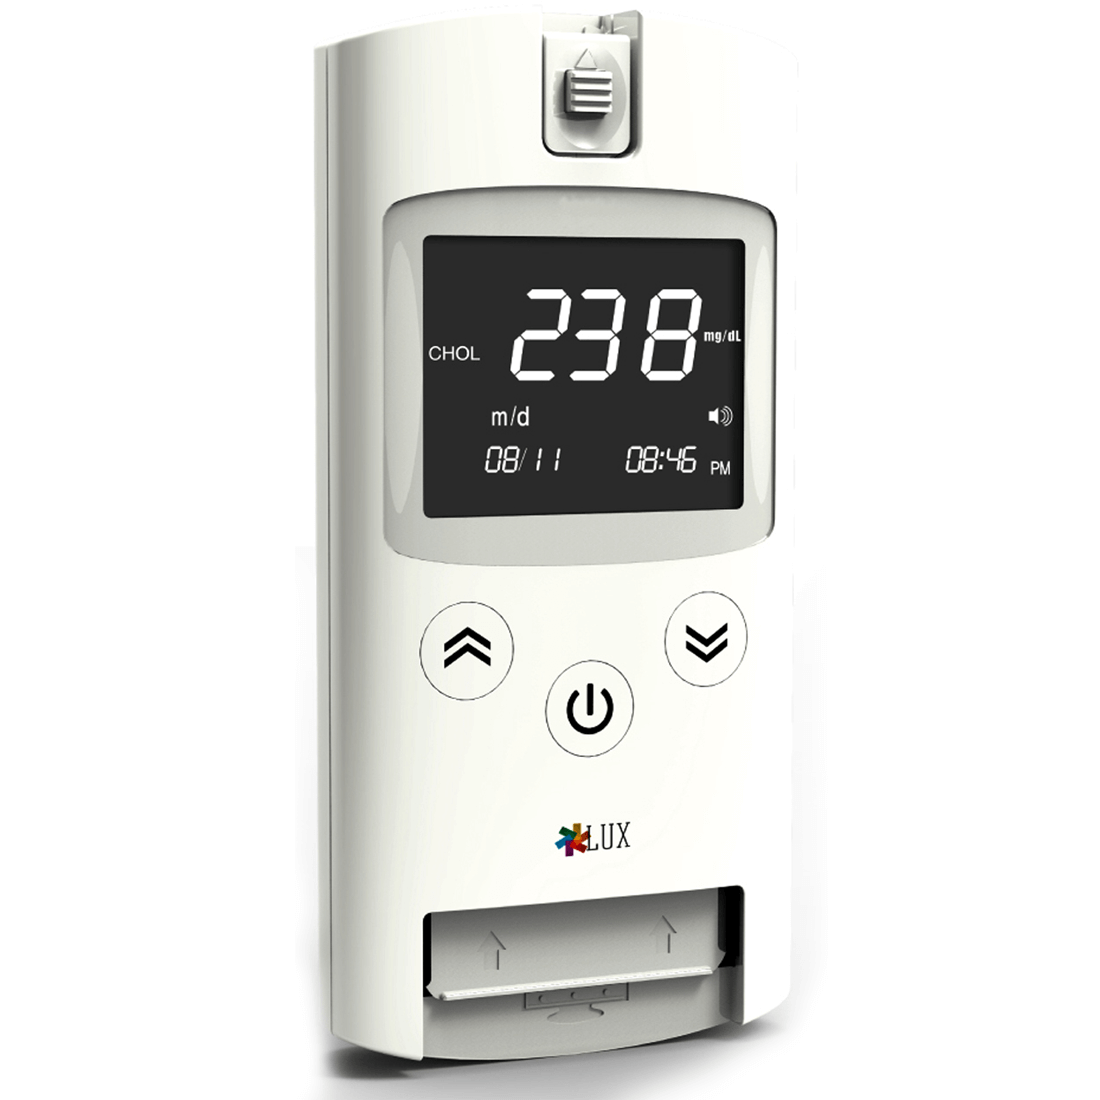 LUX Multiparameter POCT Device | For Triglycerides-Cholesterol-HDL-LDL-Haemoglobin